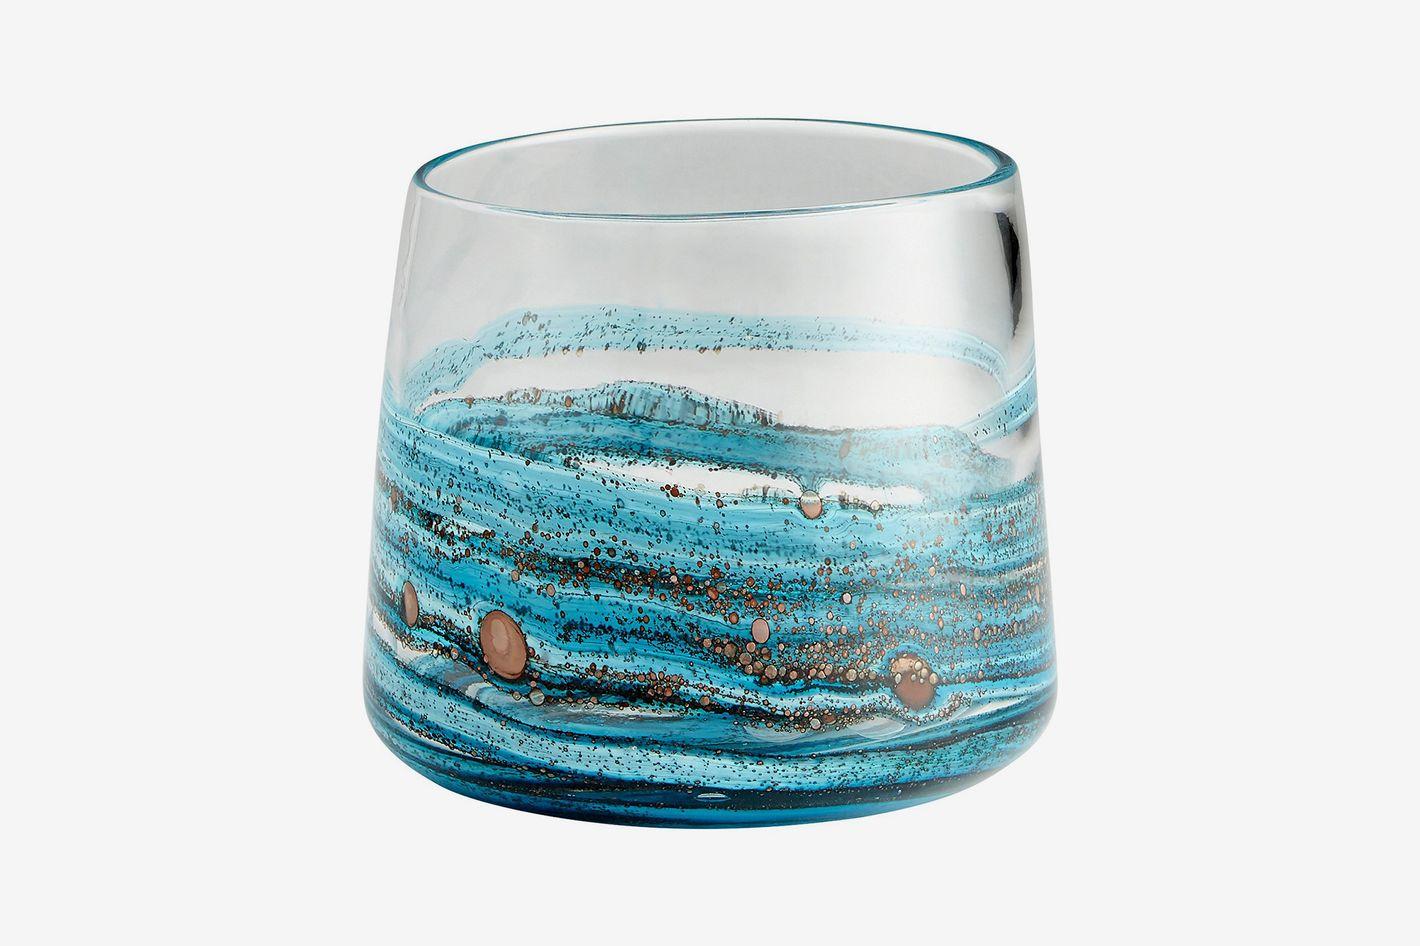 Cyan Design Rogue Vase Planter